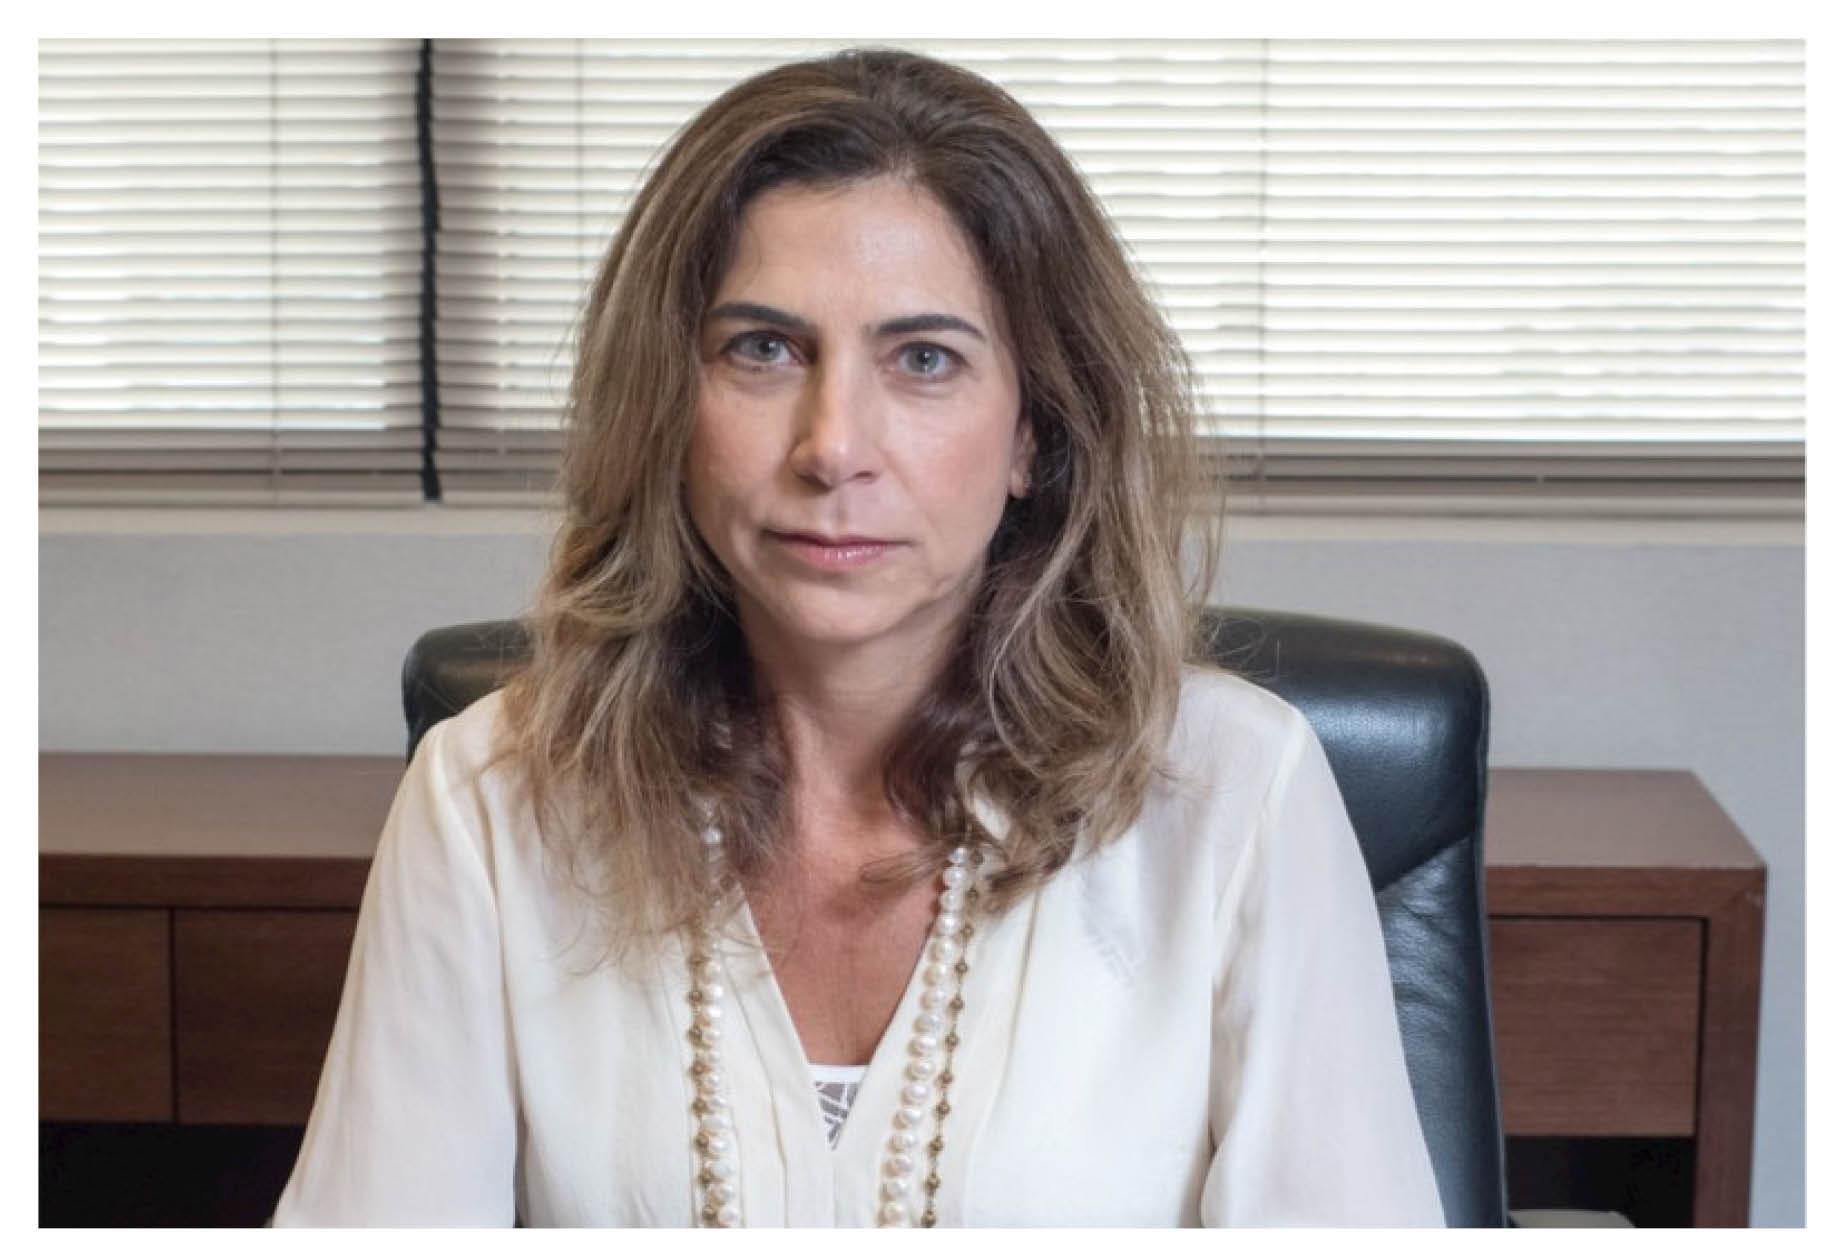 Rita Nader